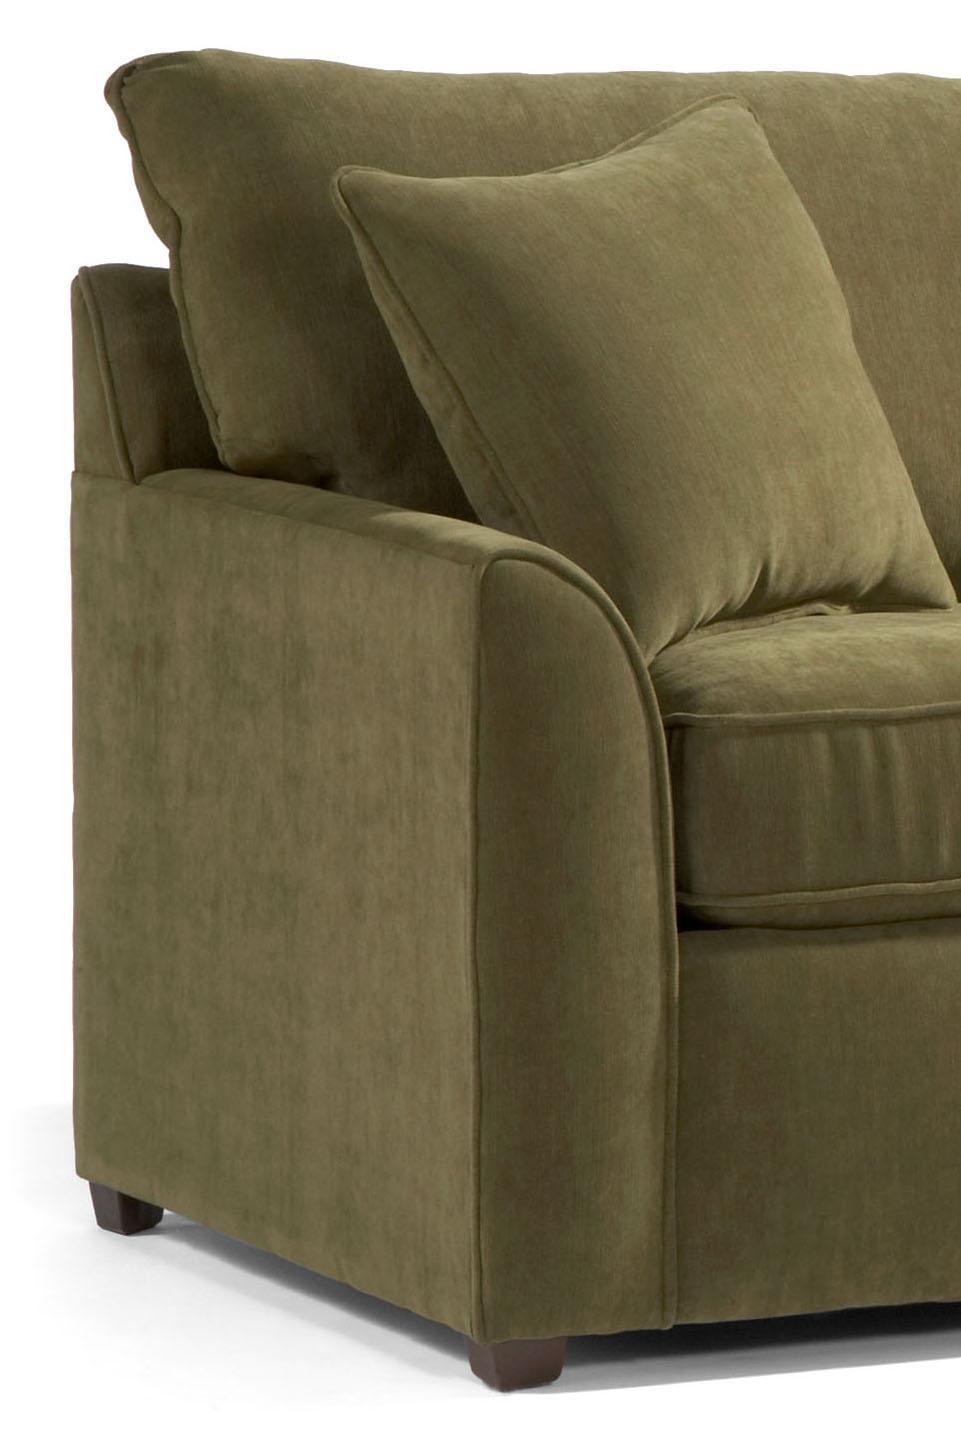 Flexsteel sleeper sofa key west refil sofa for Wayside furniture